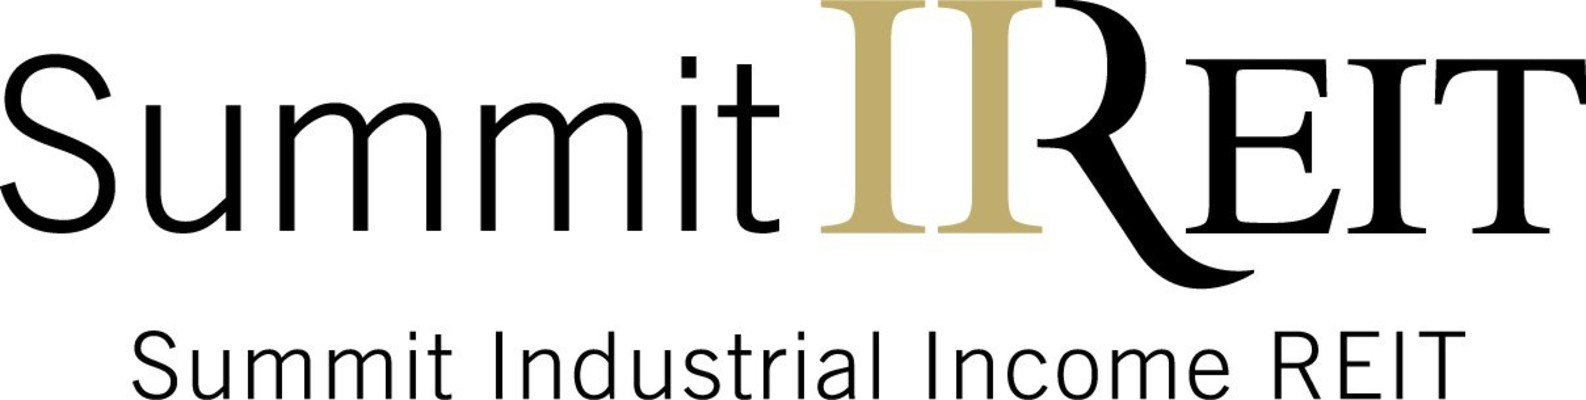 Summit II REIT Logo (CNW Group/Summit Industrial Income REIT)